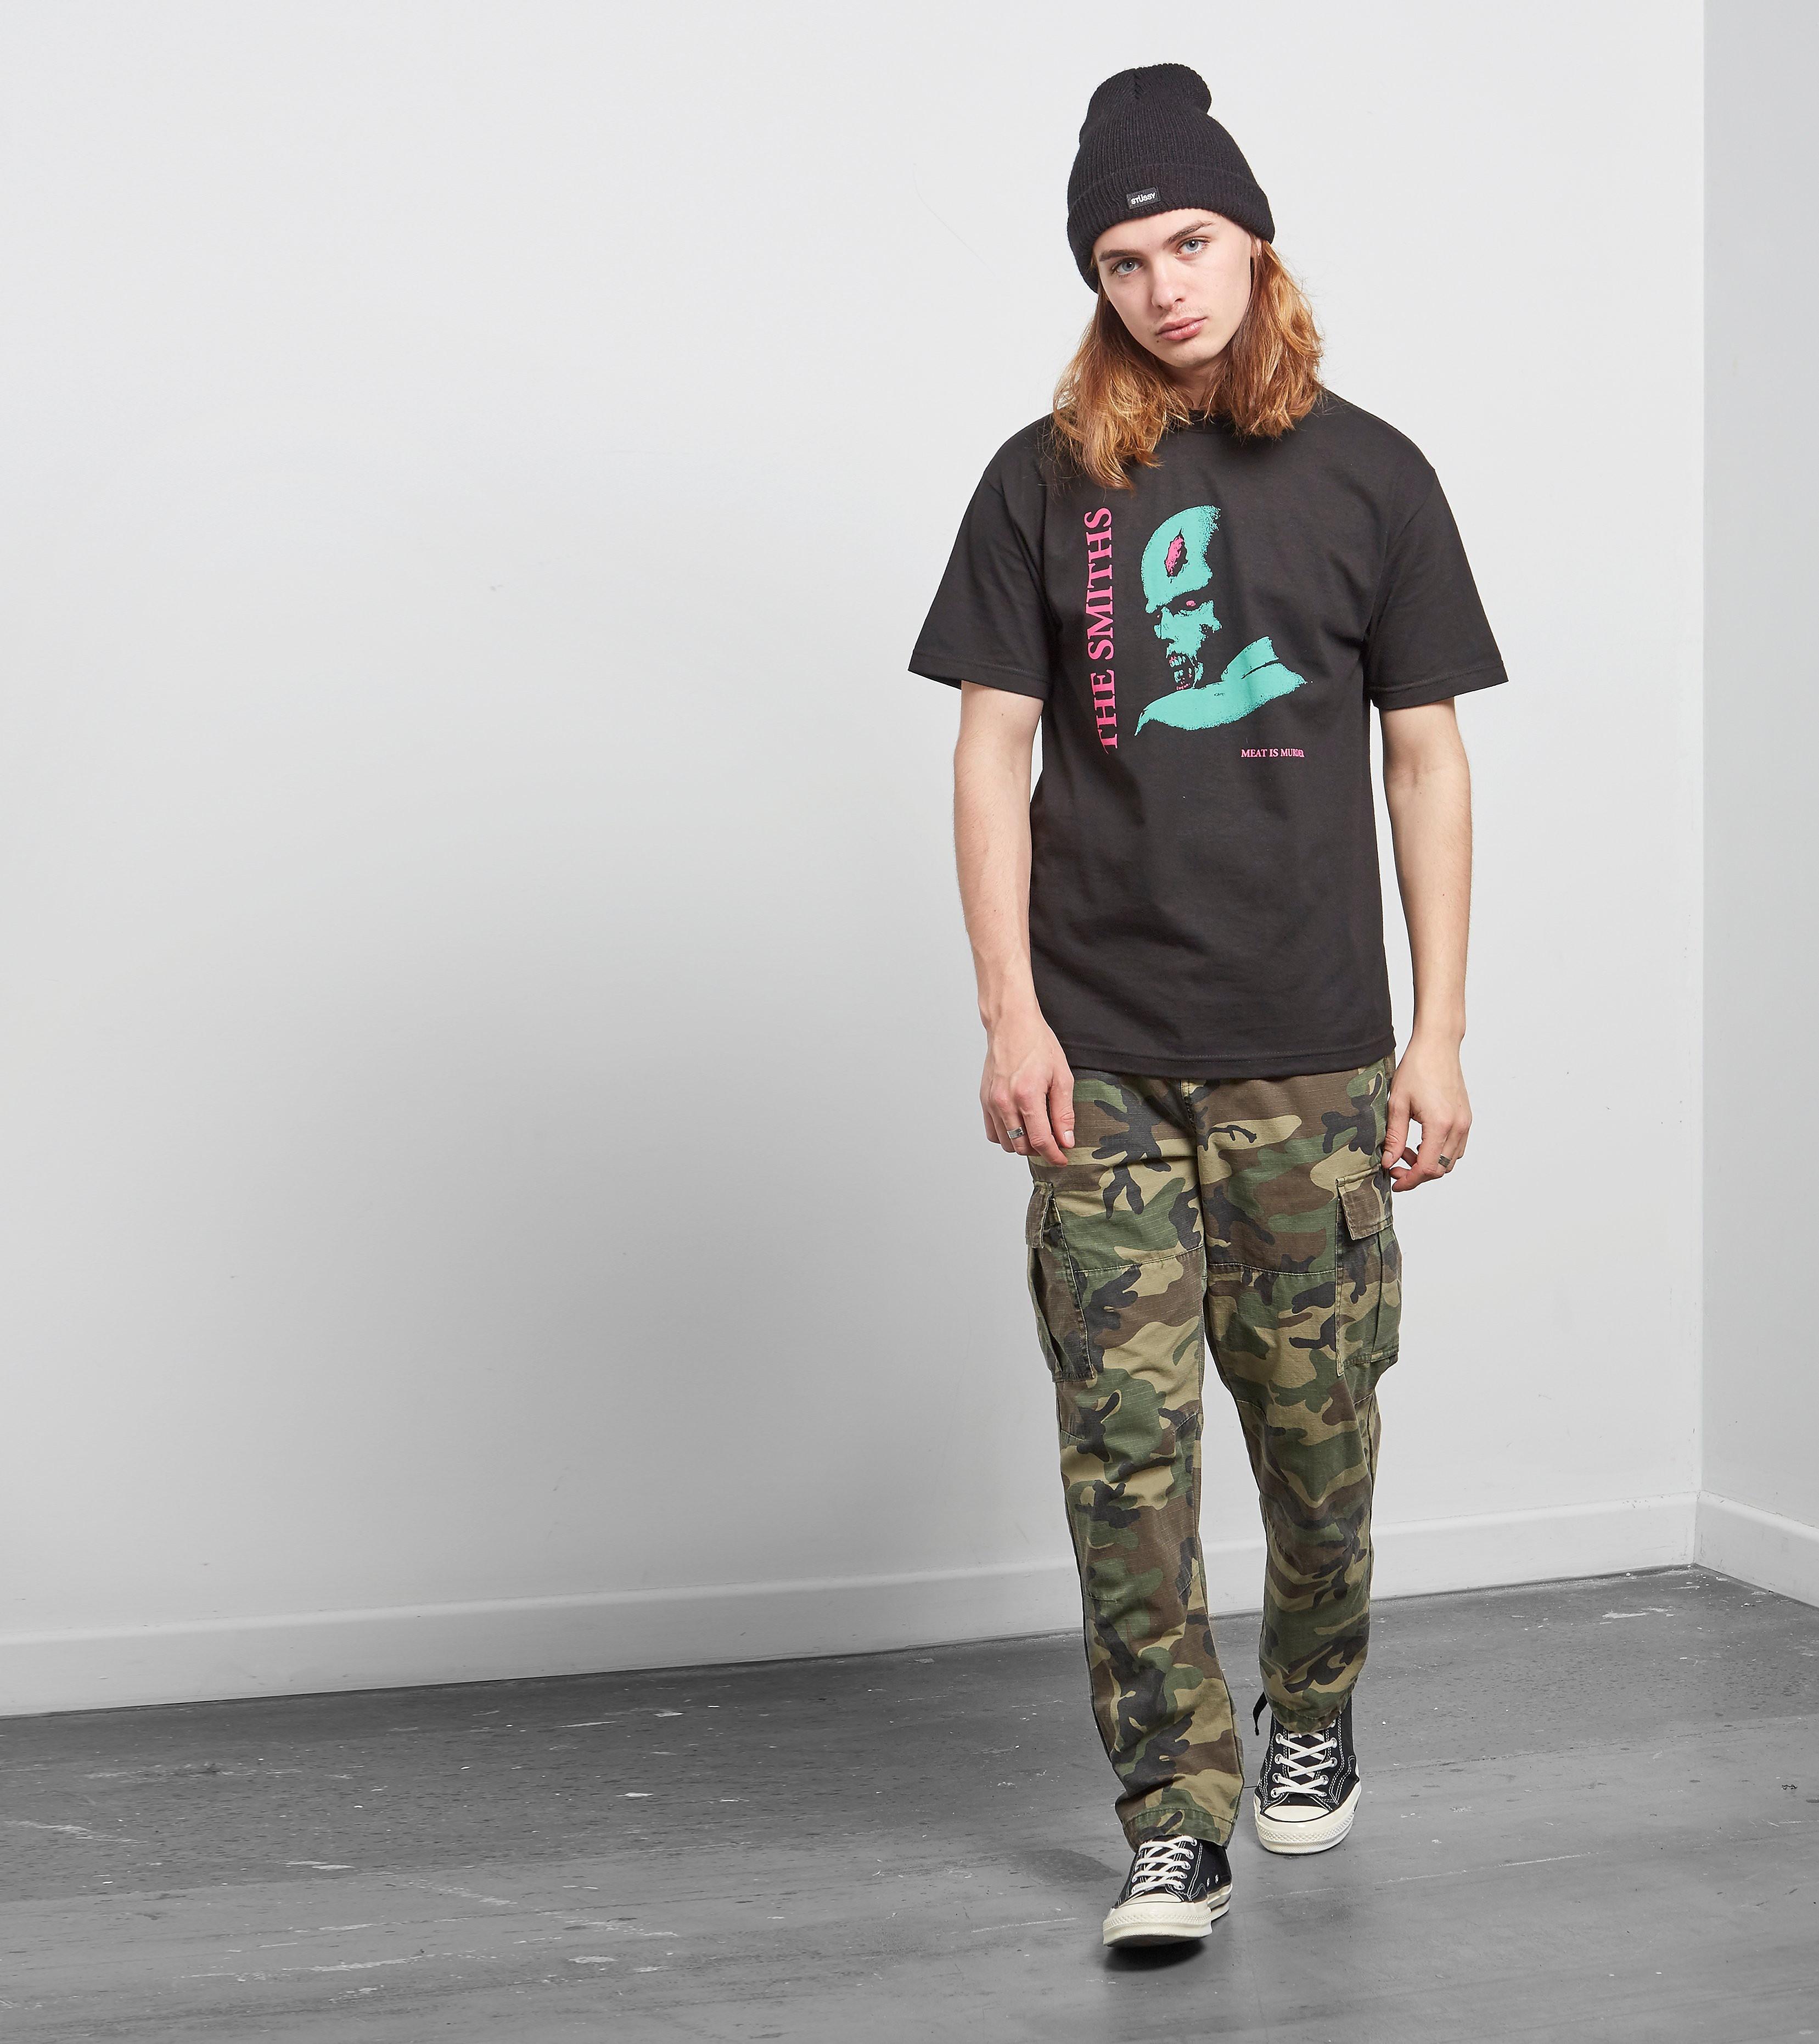 BOW3RY Bootleg V2 T-Shirt